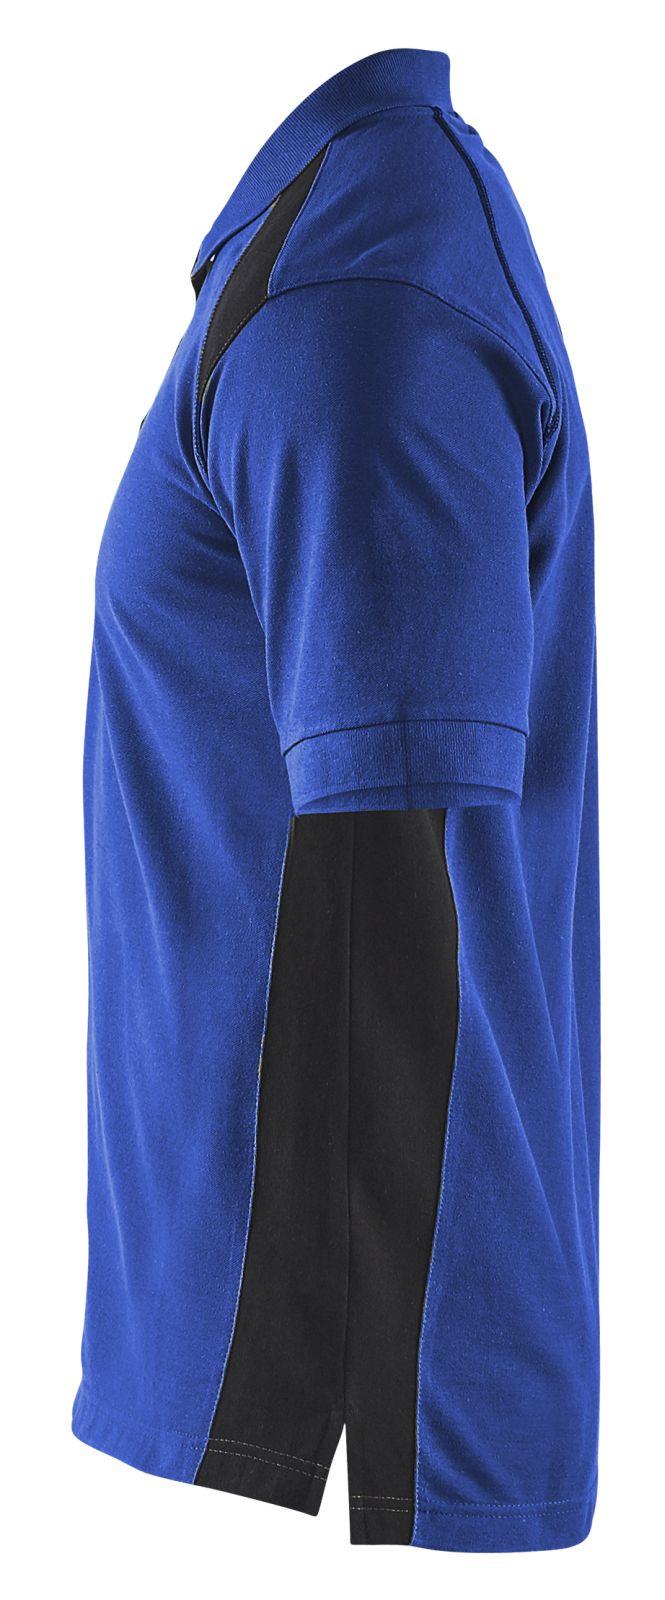 Blaklader Poloshirts 33241050 korenblauw-zwart(8599)